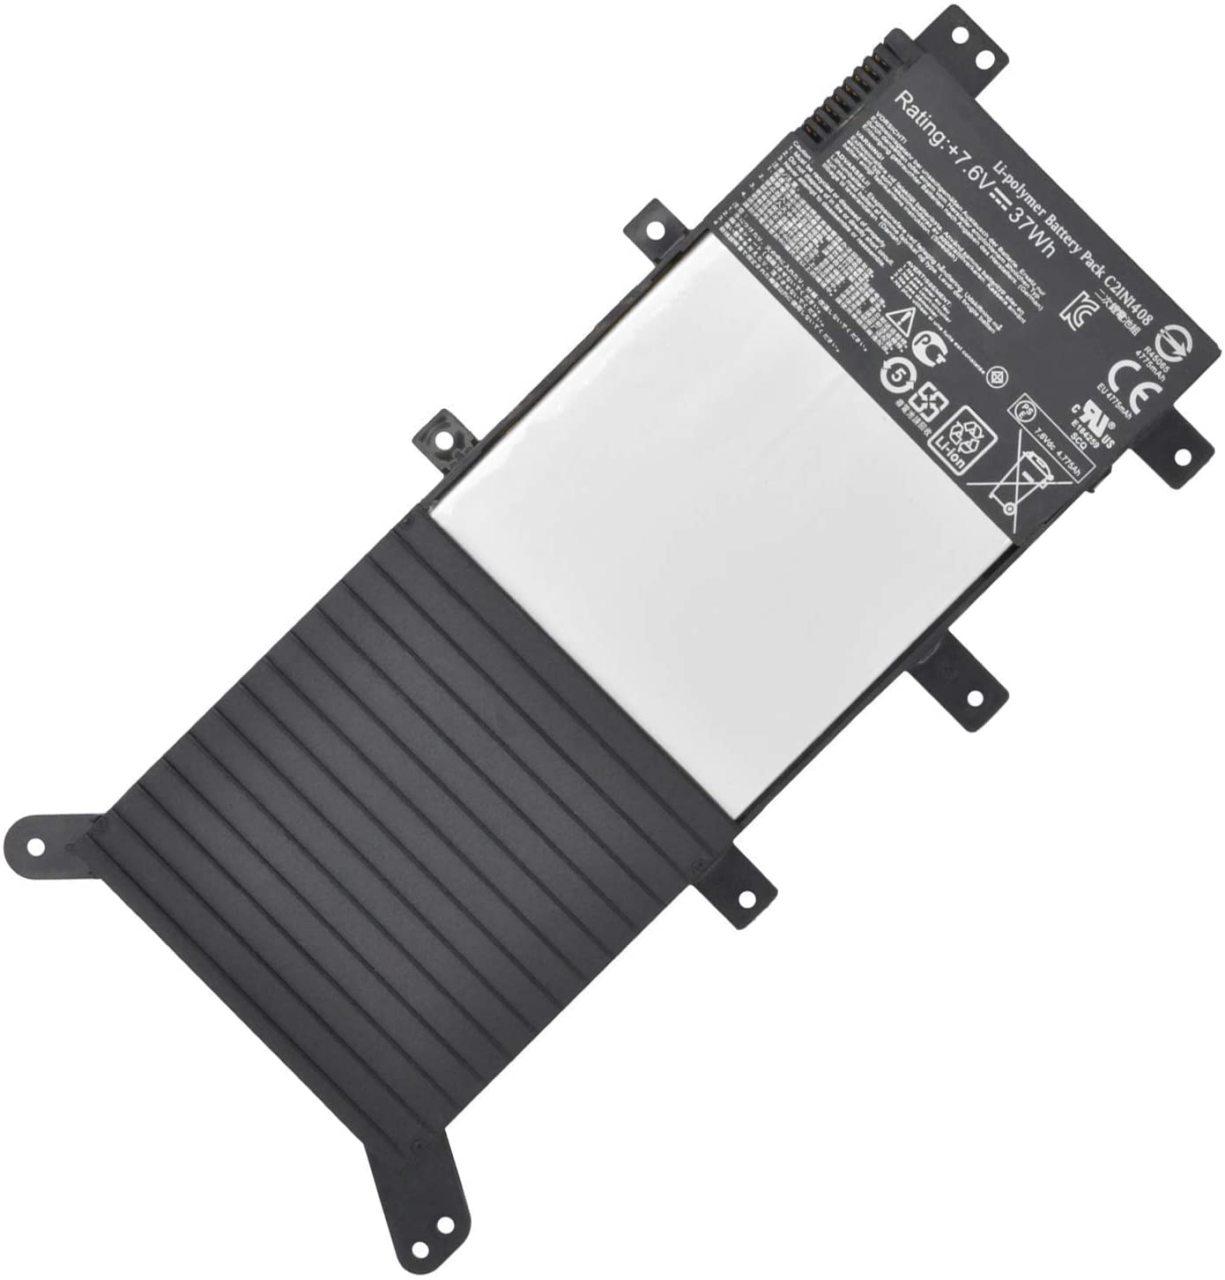 Asus Muadil C21N1408 A555 K555, K555L, K555LA, K555LB, K555U, K555UB, K555L, K555LN Batarya Pil